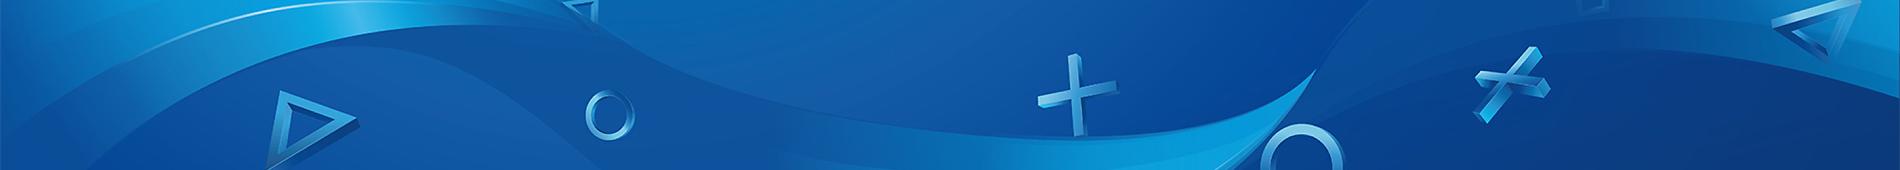 Sony Playstation Swish Btm Banner